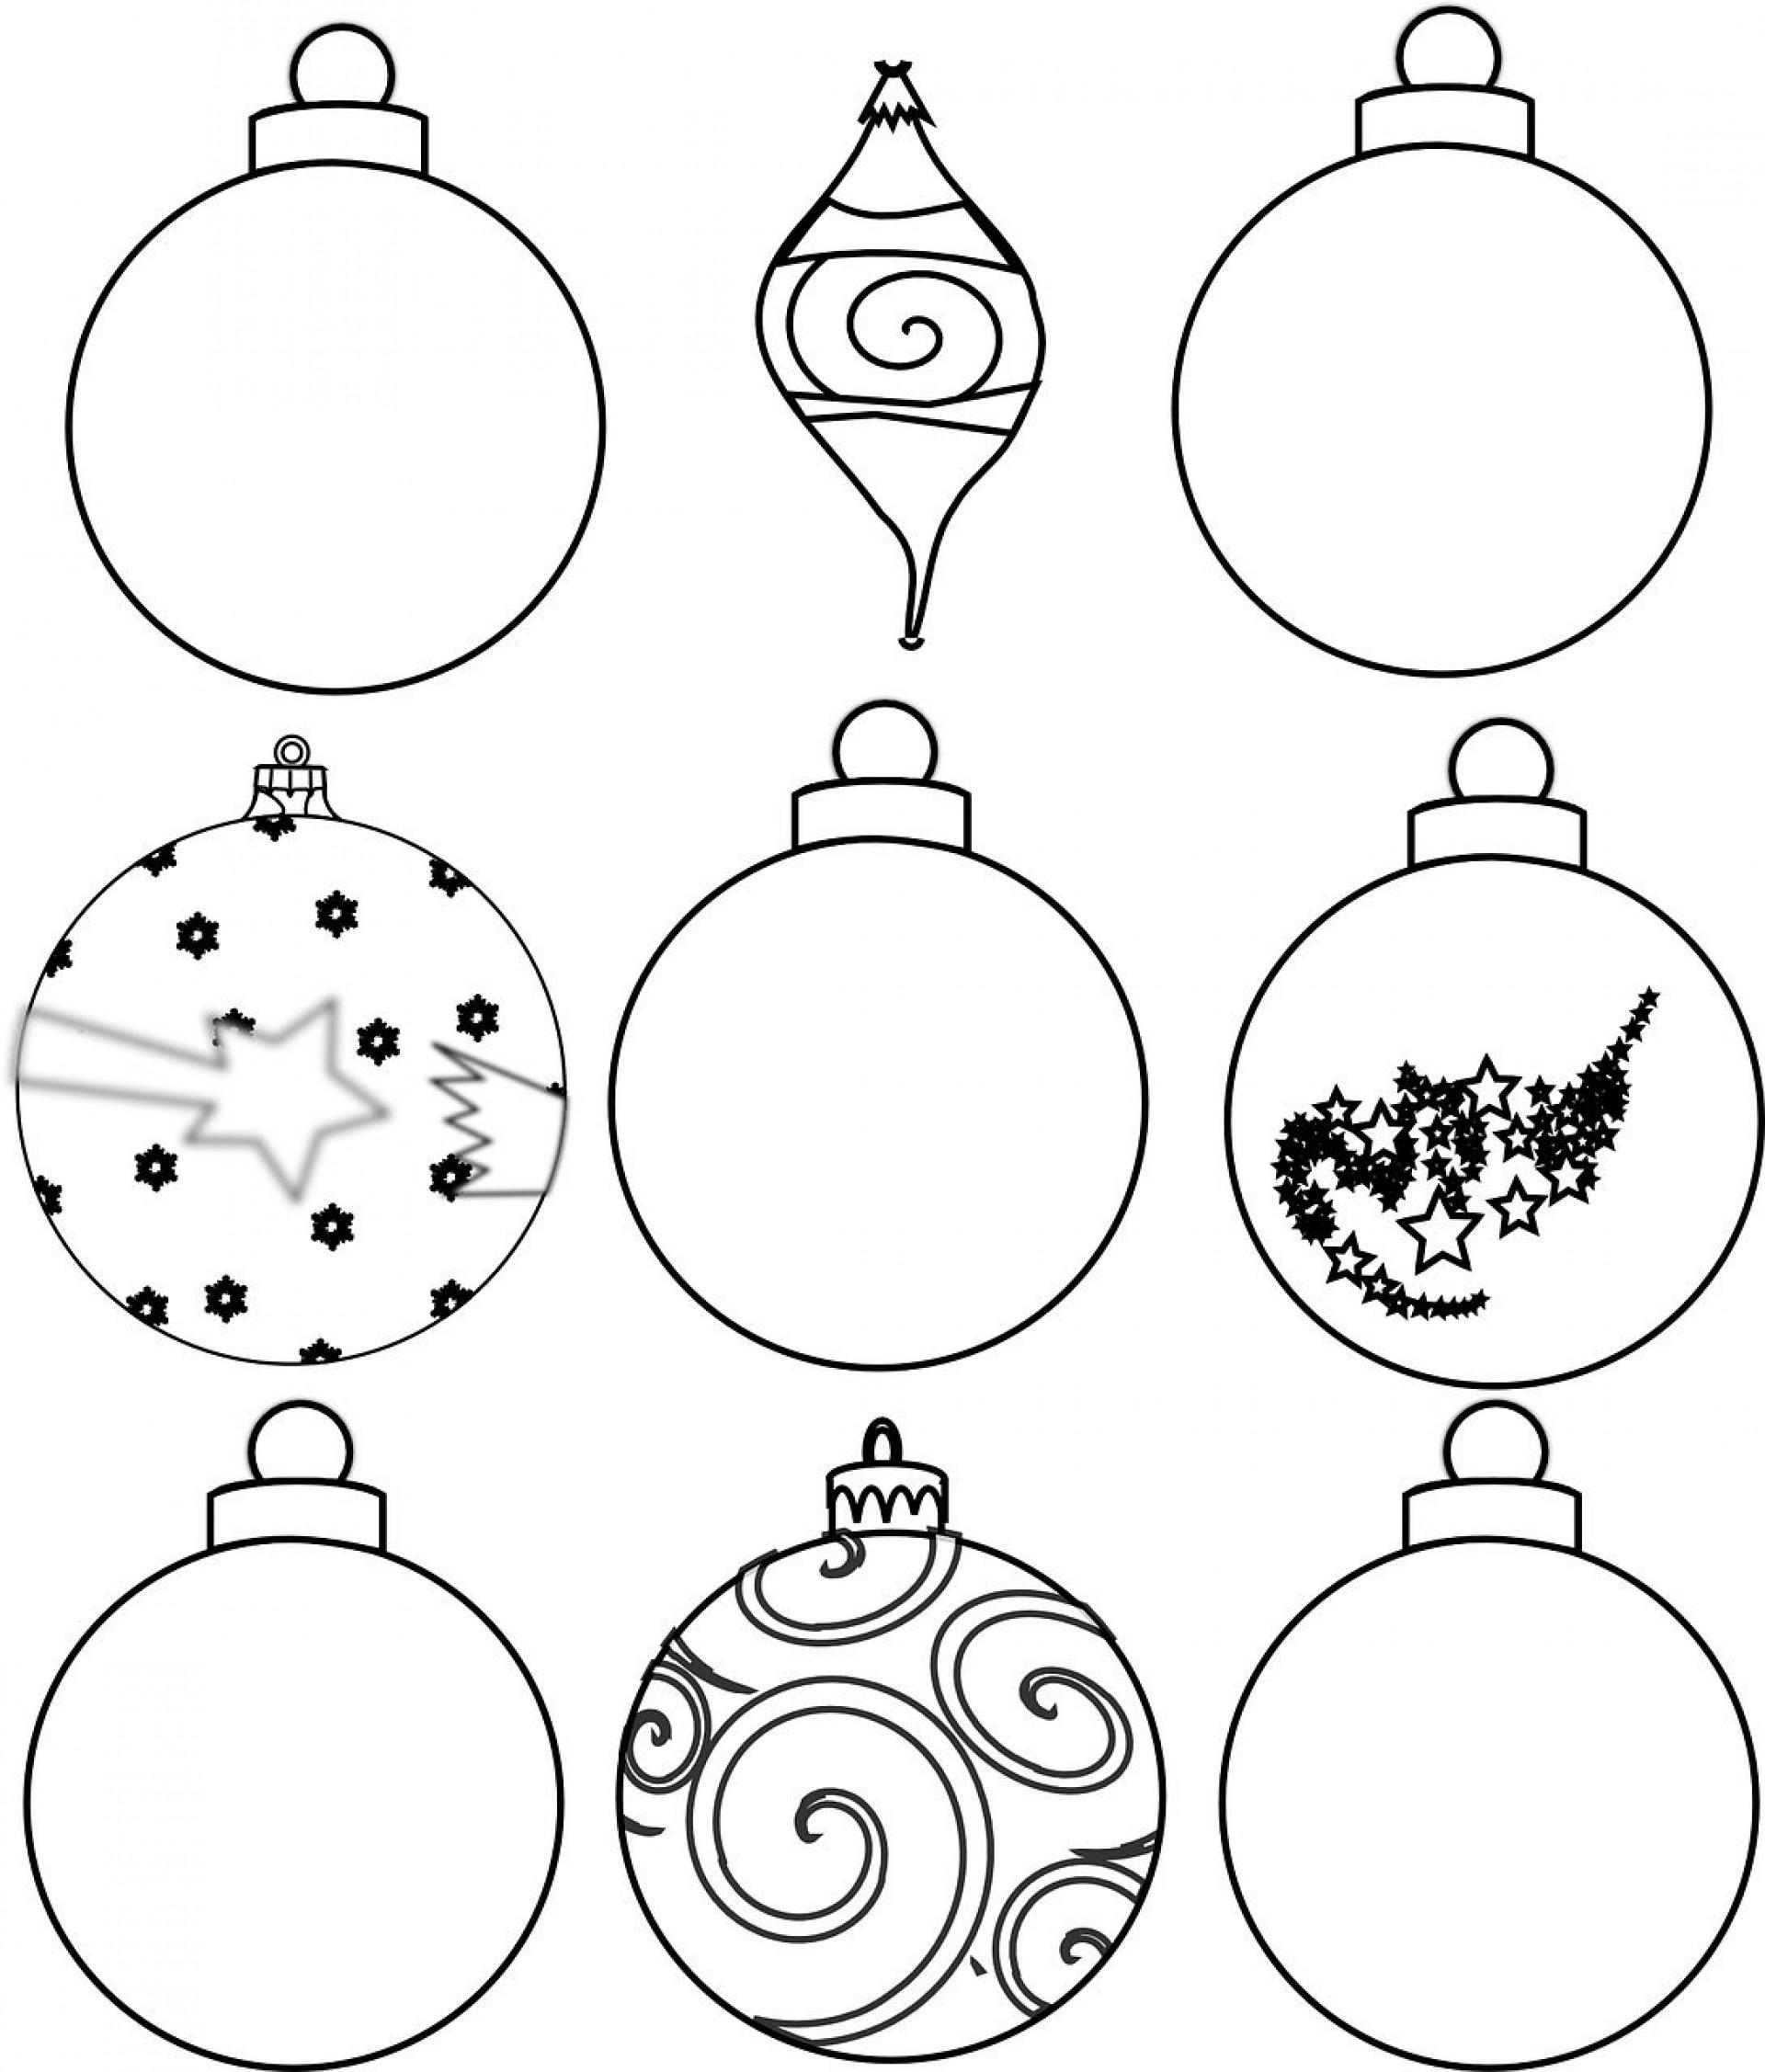 002 Excellent Printable Christma Ornament Template Sample  Templates Stencil Felt Pattern Tree1920